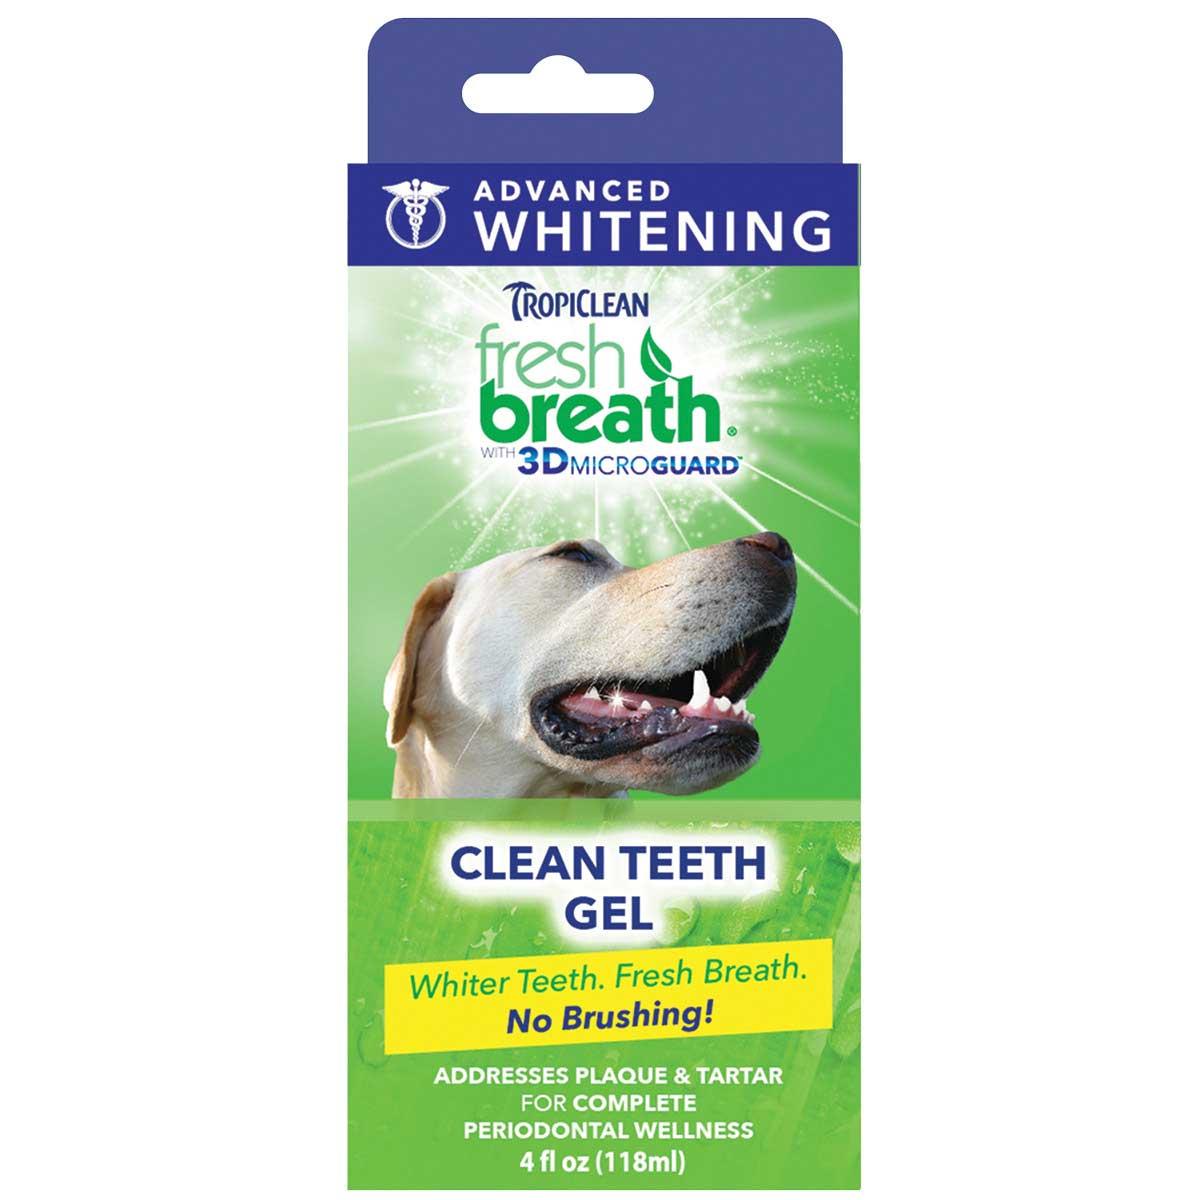 Tropiclean Fresh Breath Clean Teeth Gel with 3D Microguard for Dogs